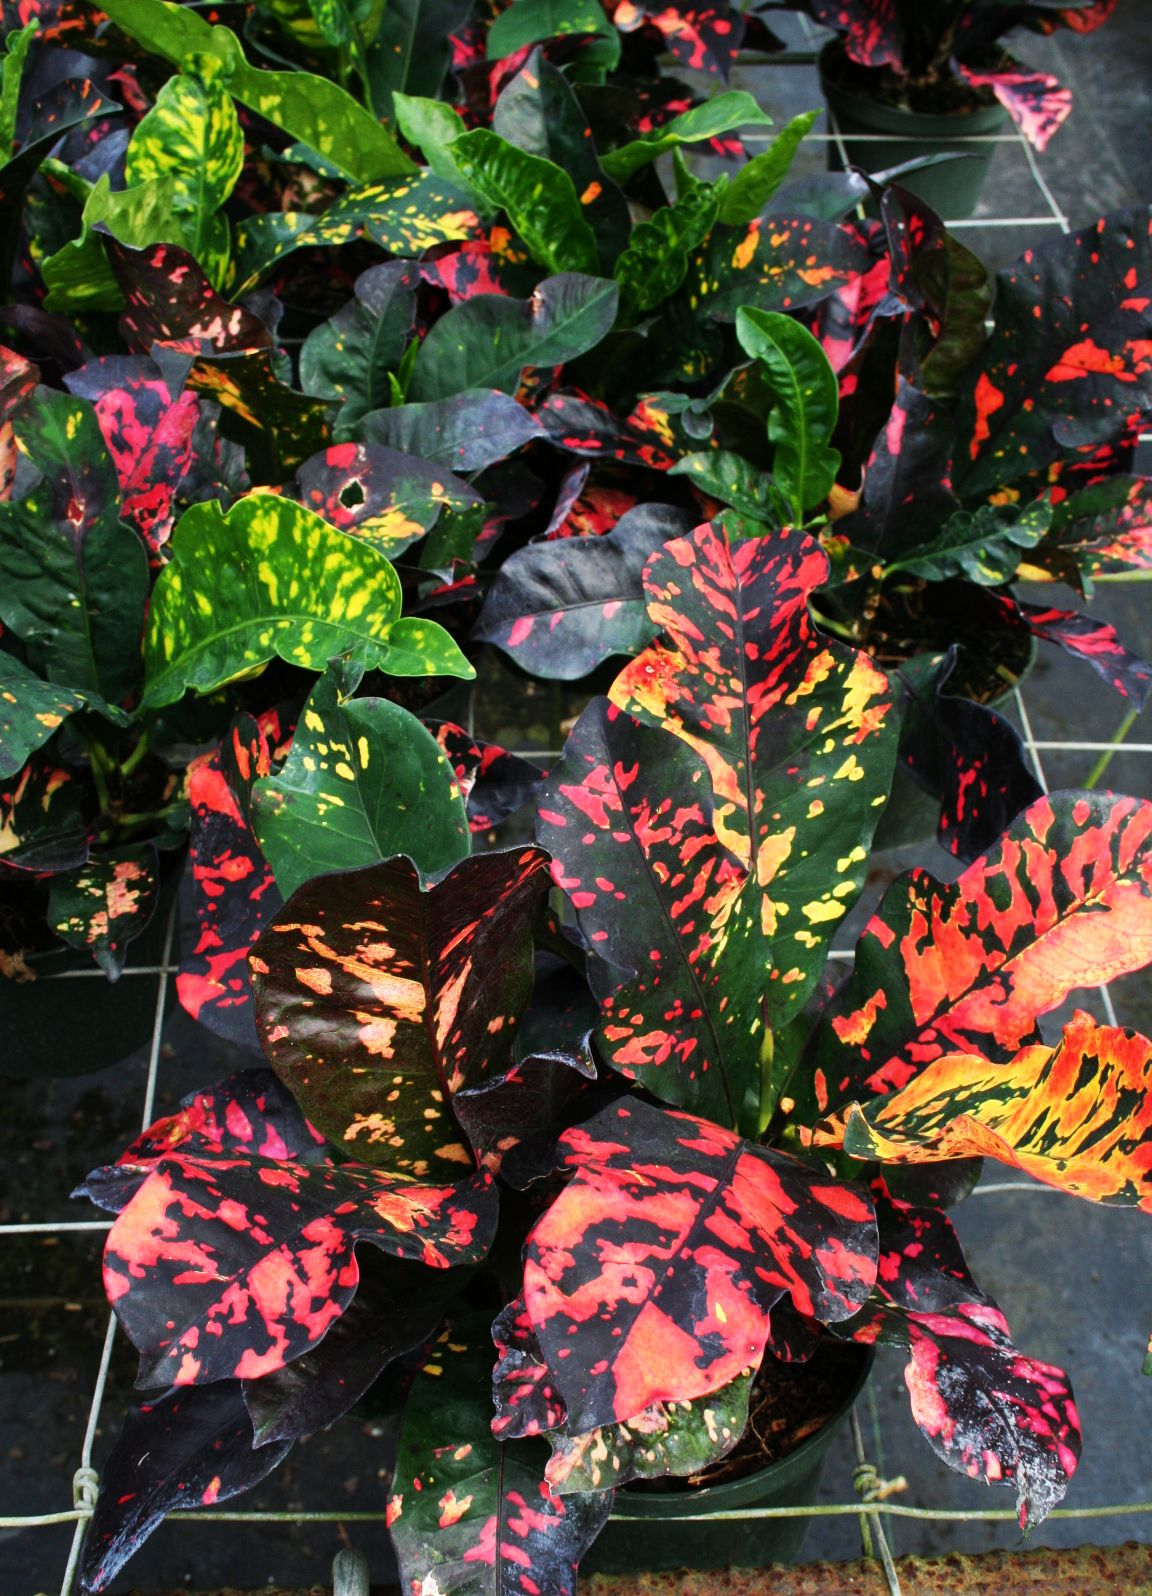 Blondie's Treehouse Inc, green plants, greenhouse, Croton